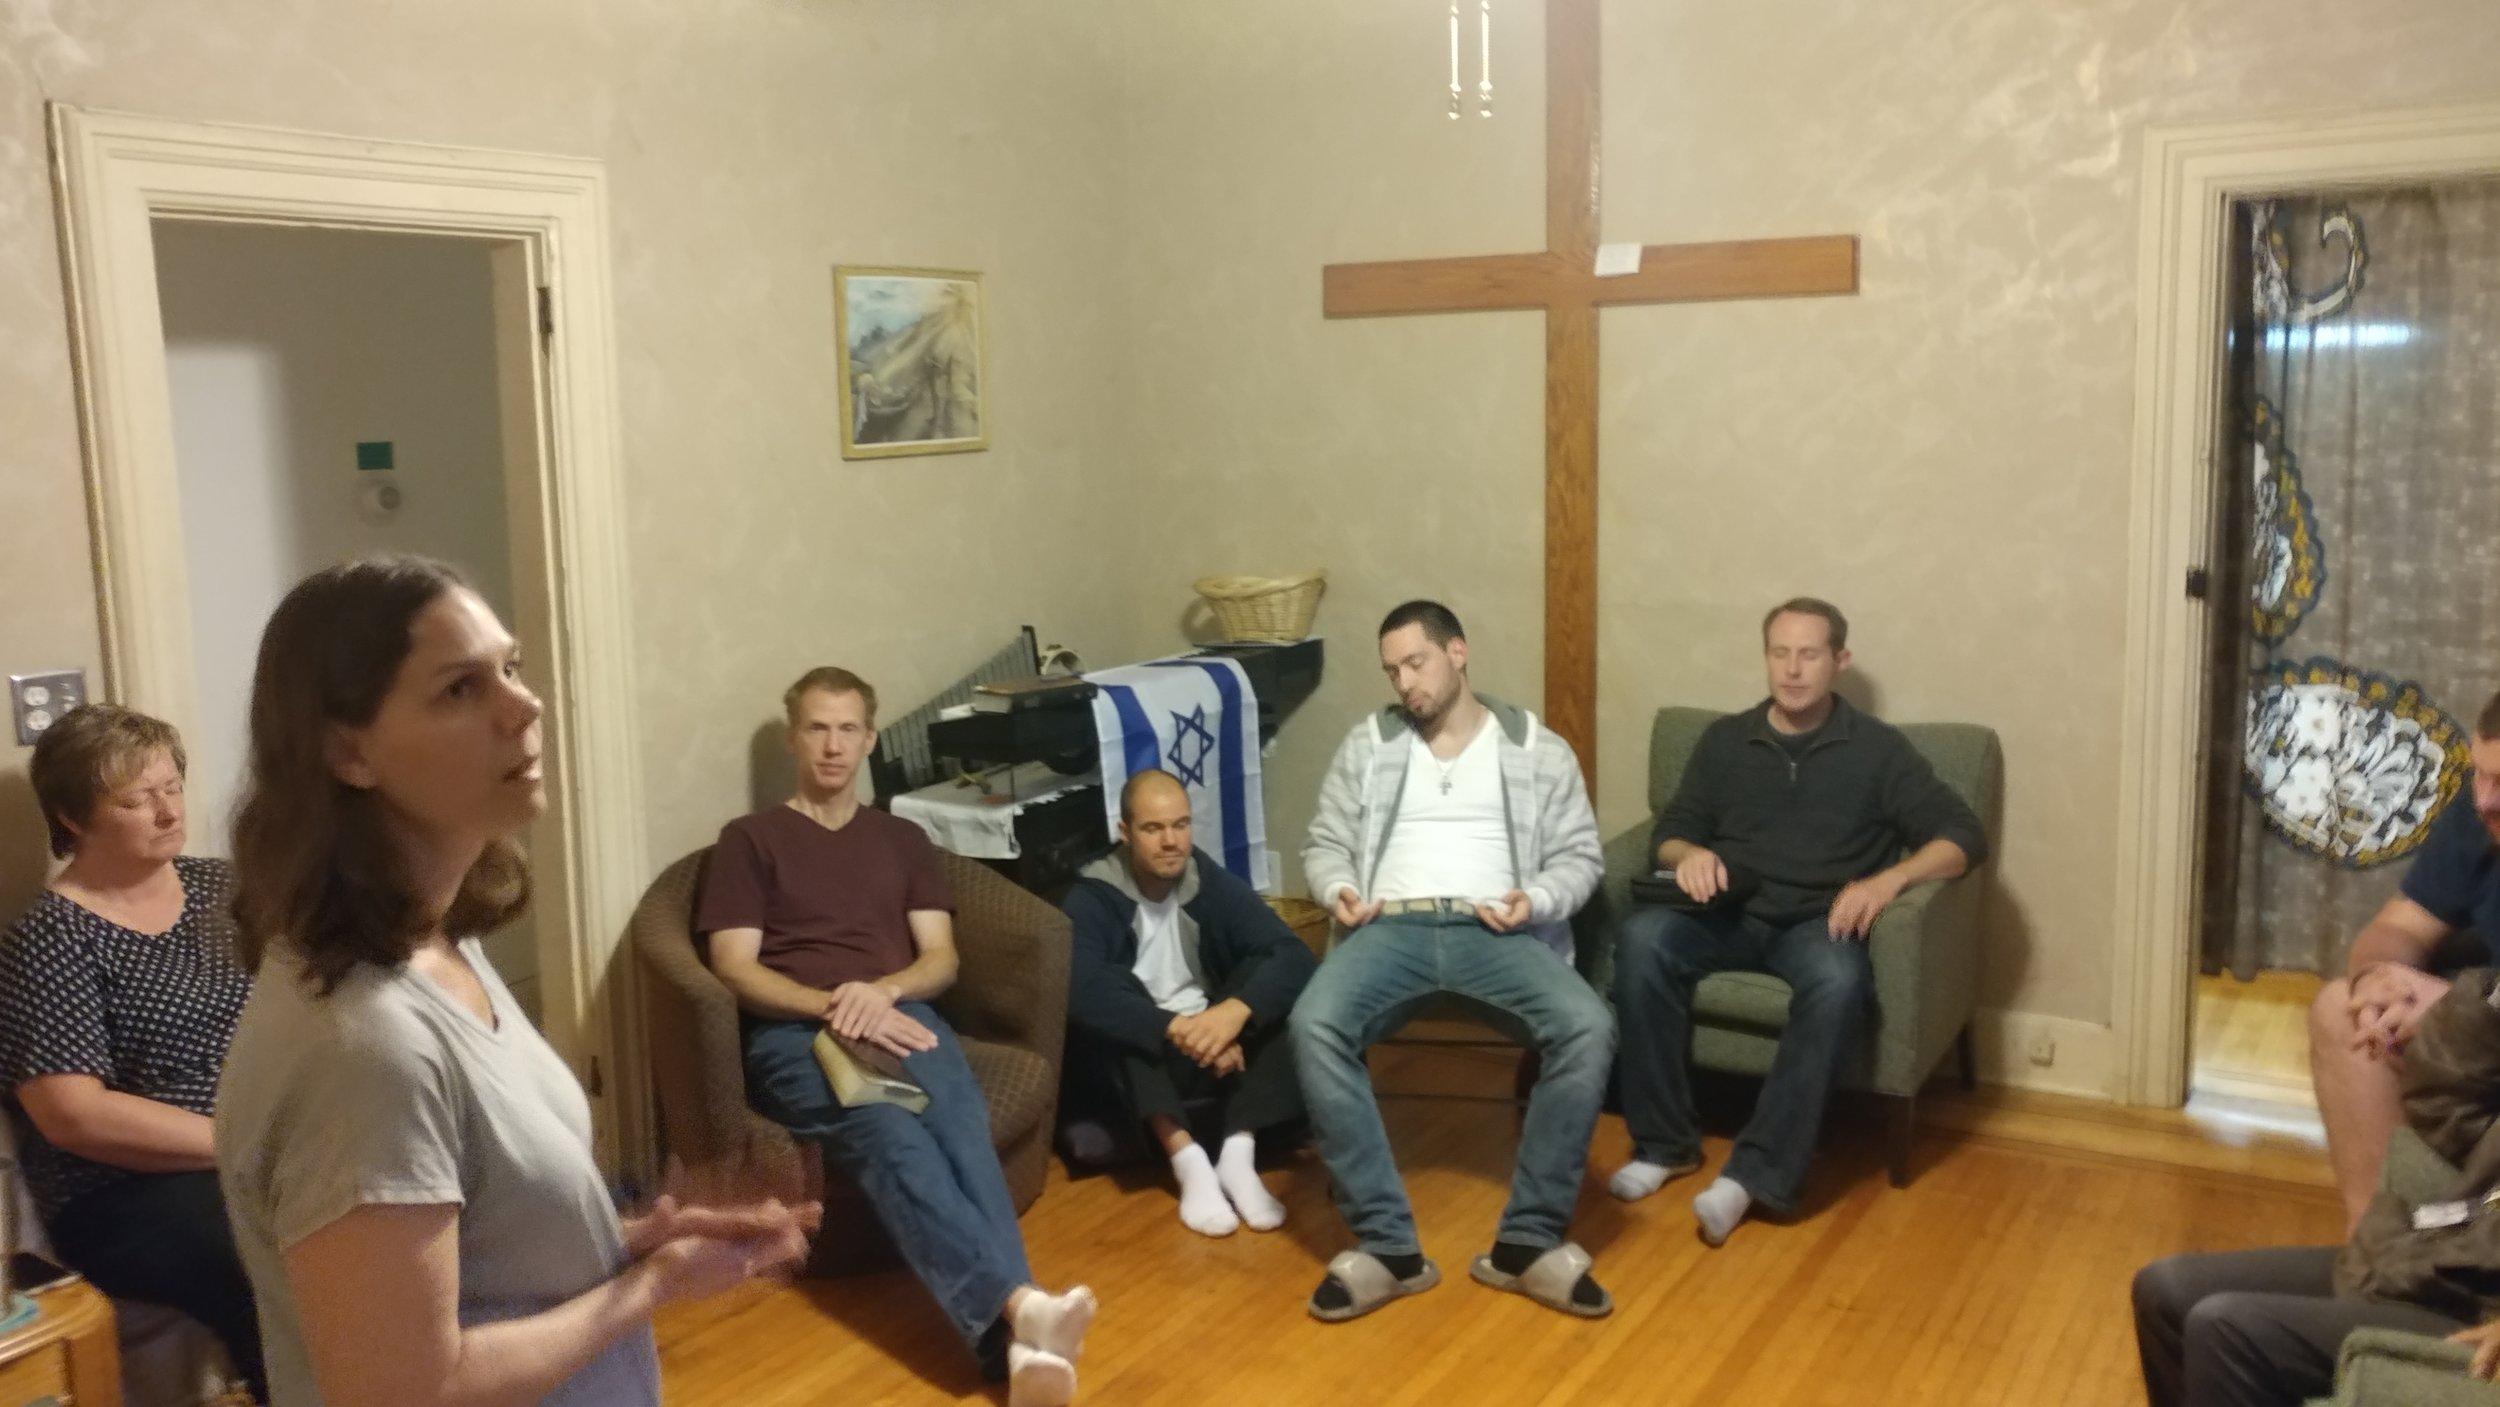 10-17-17 Group prayer.jpg